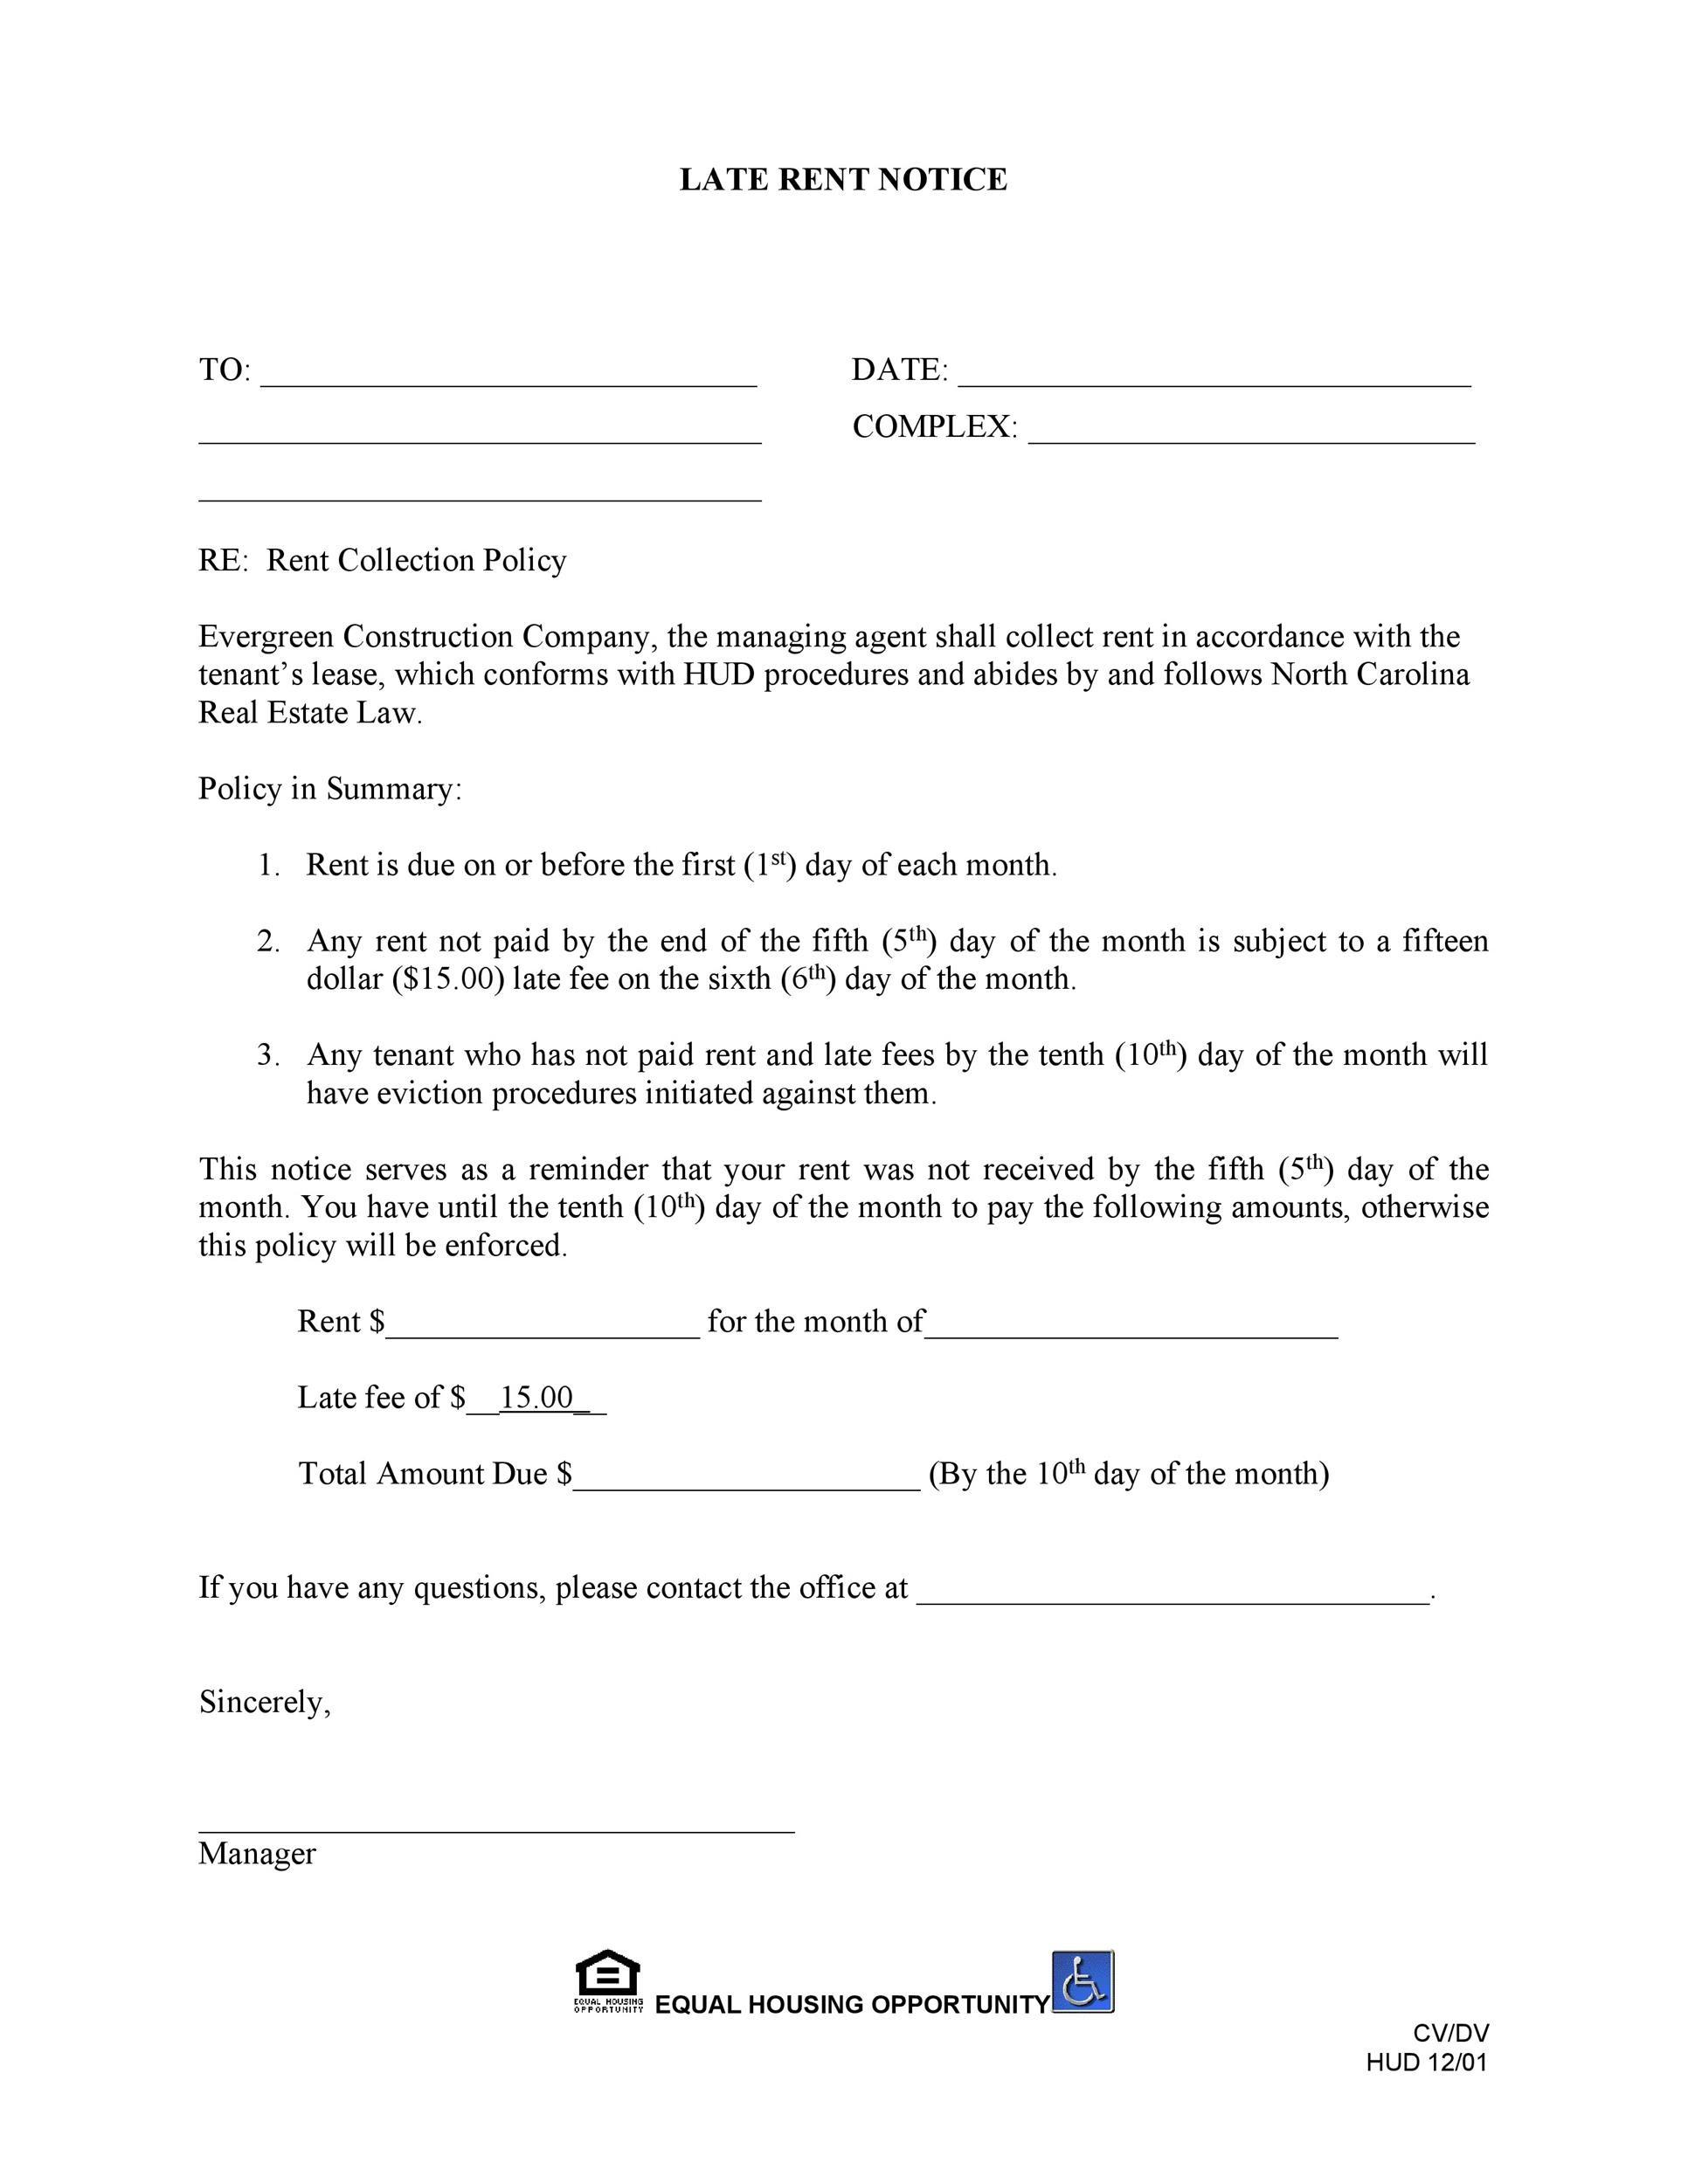 30 Printable Late Rent Notice Templates ᐅ TemplateLab